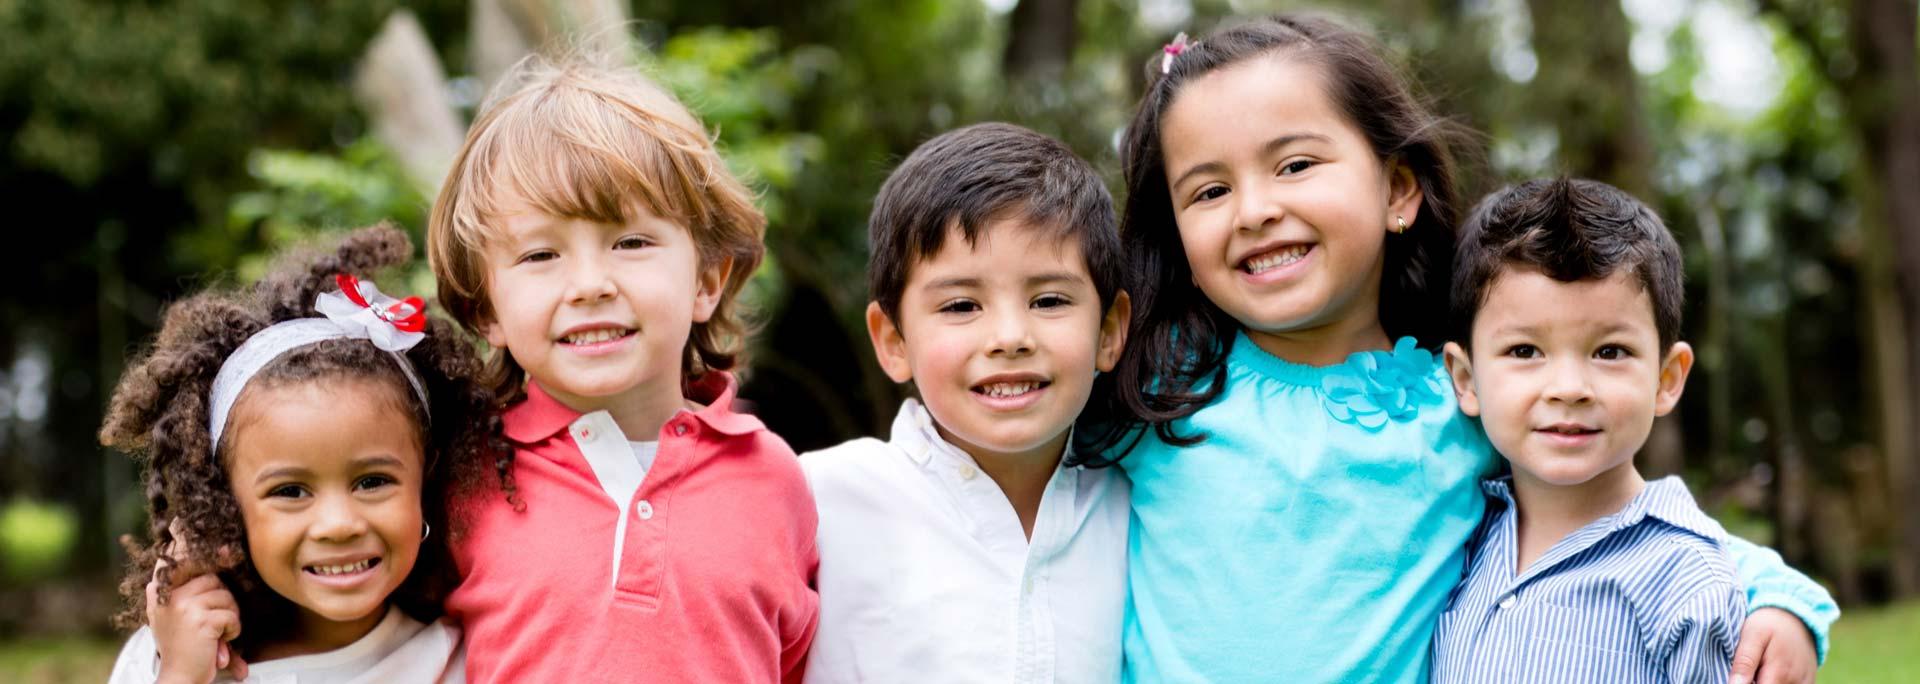 Chestermere Childrens Dentistry